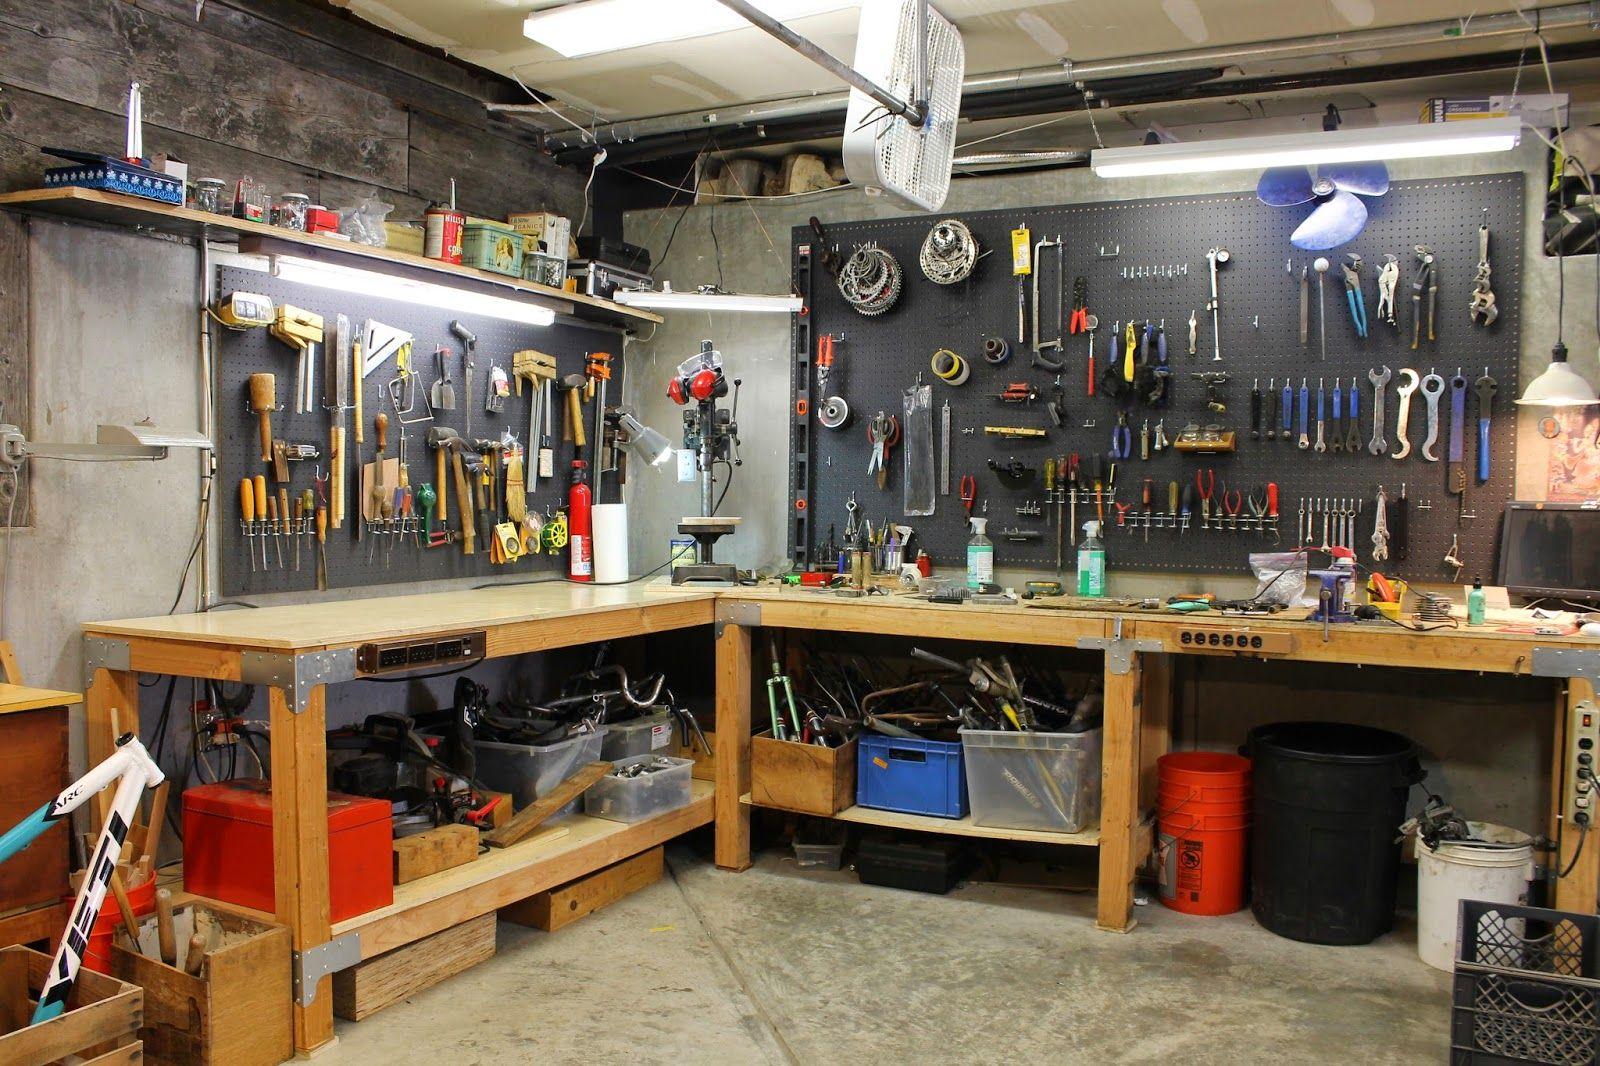 The Shingled House Garage Work Bench Garage Design Basement Workshop